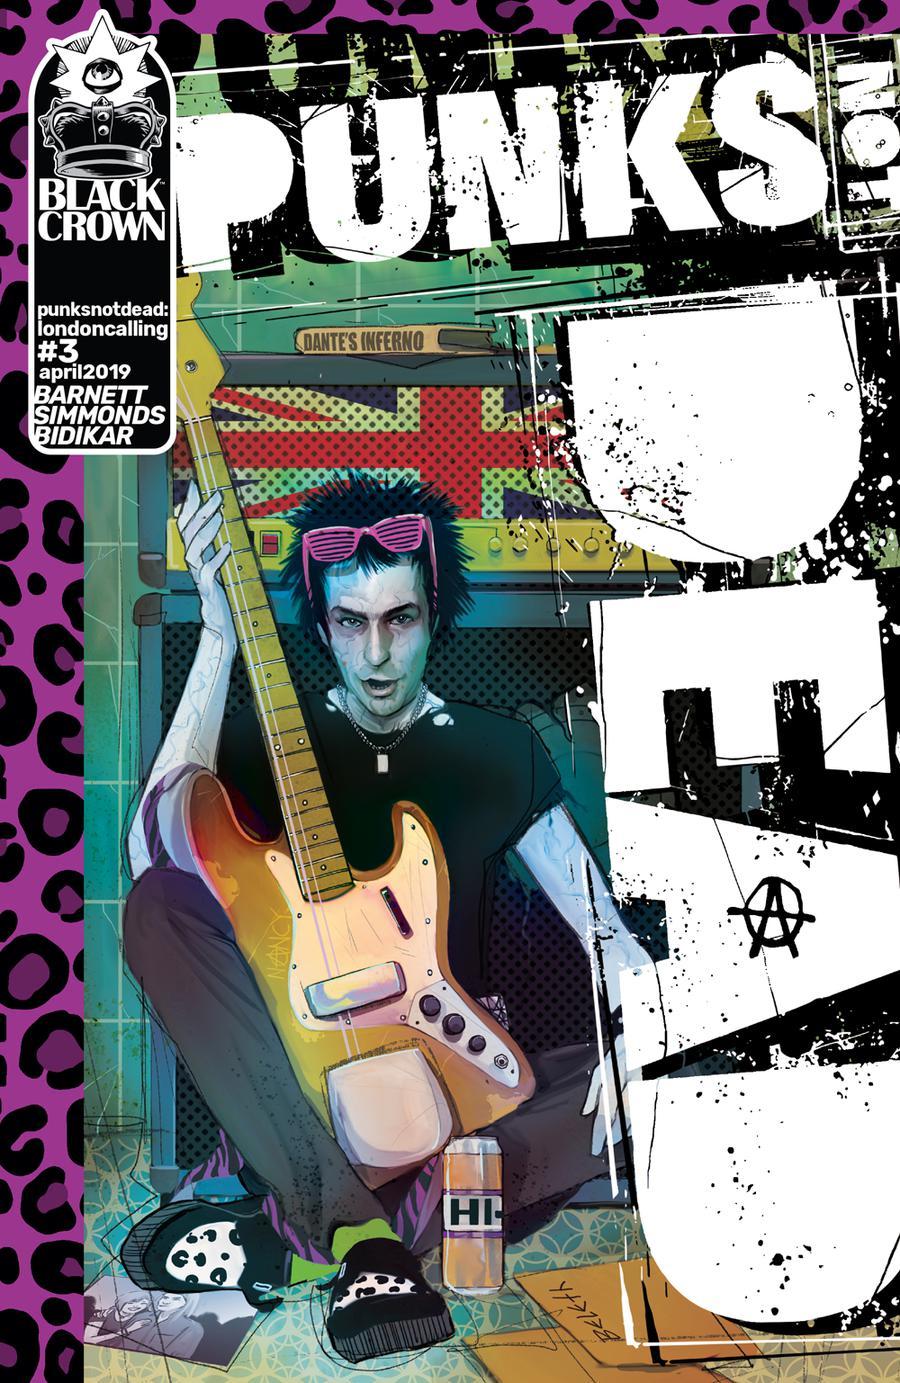 Punks Not Dead London Calling #3